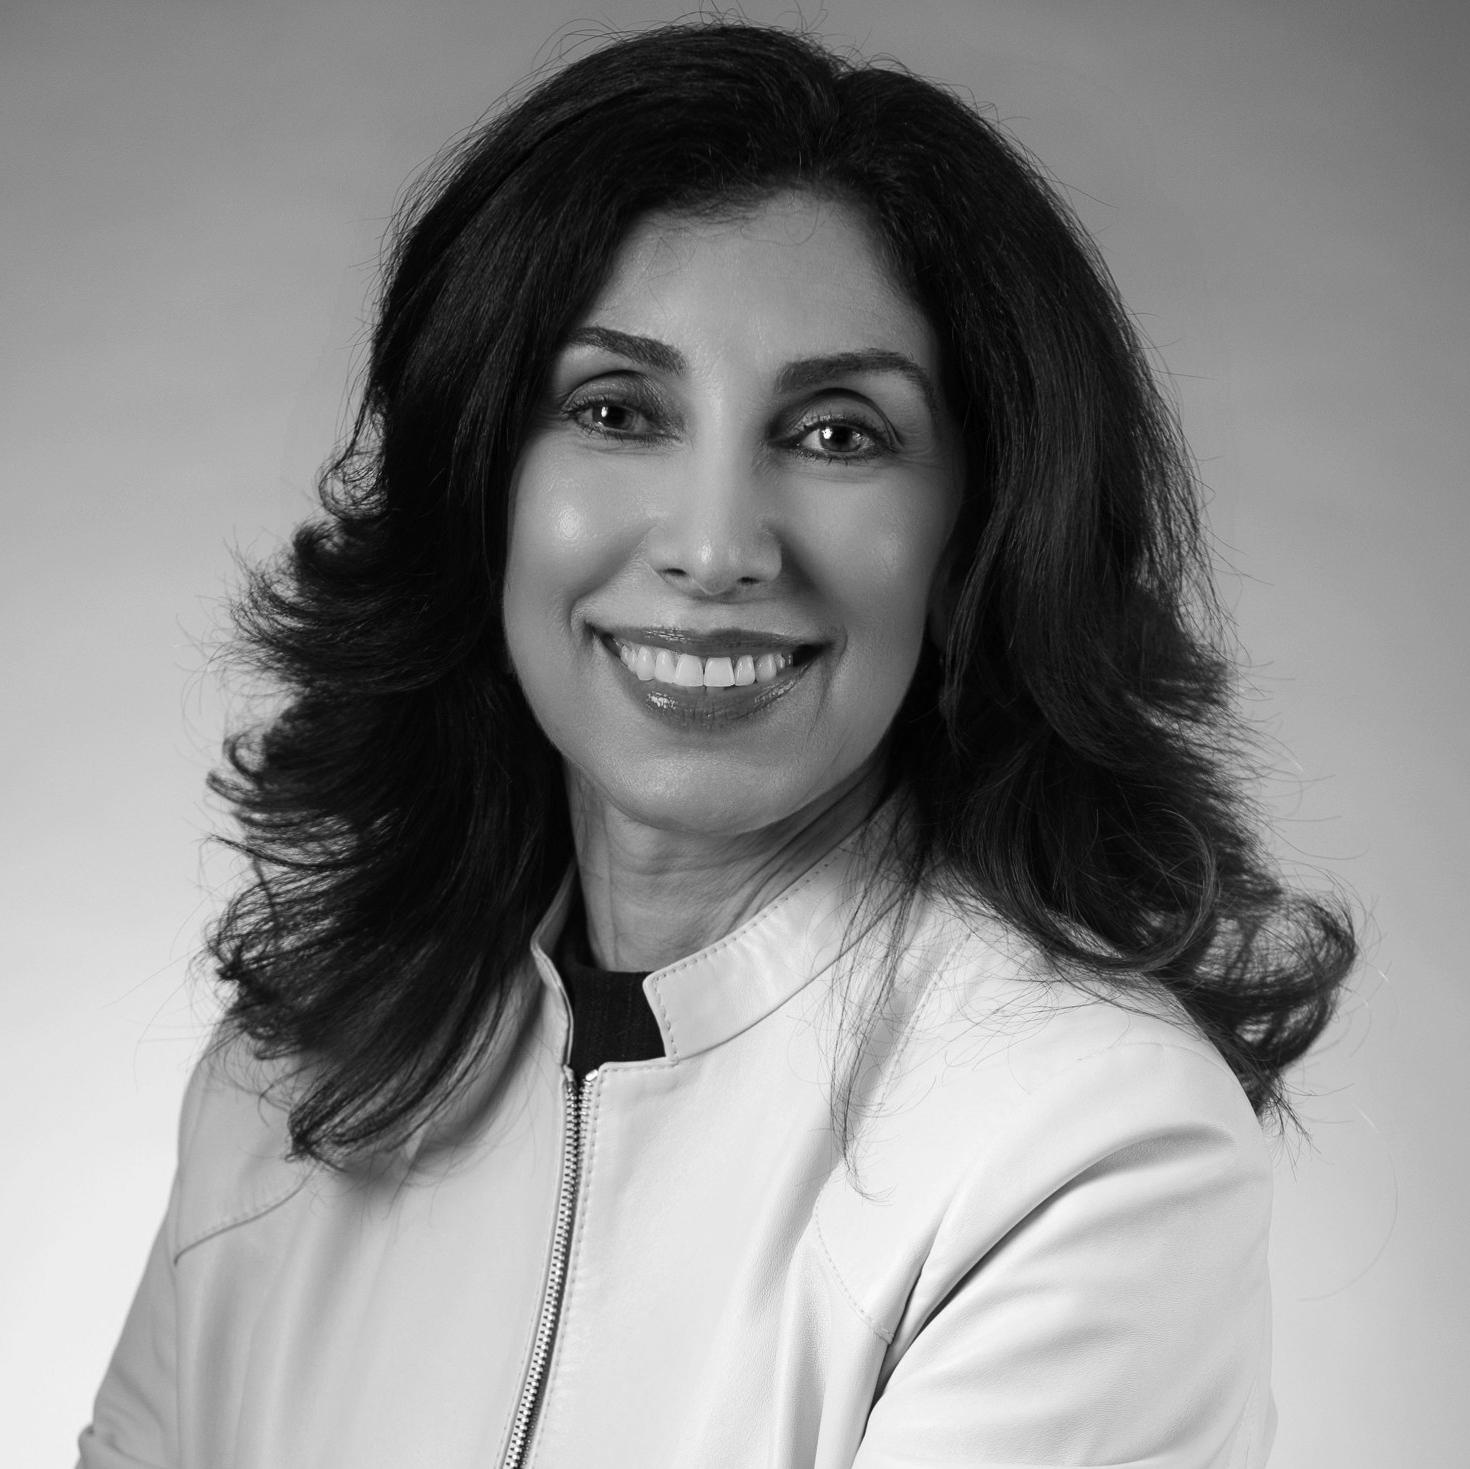 Roxanne Tashjian